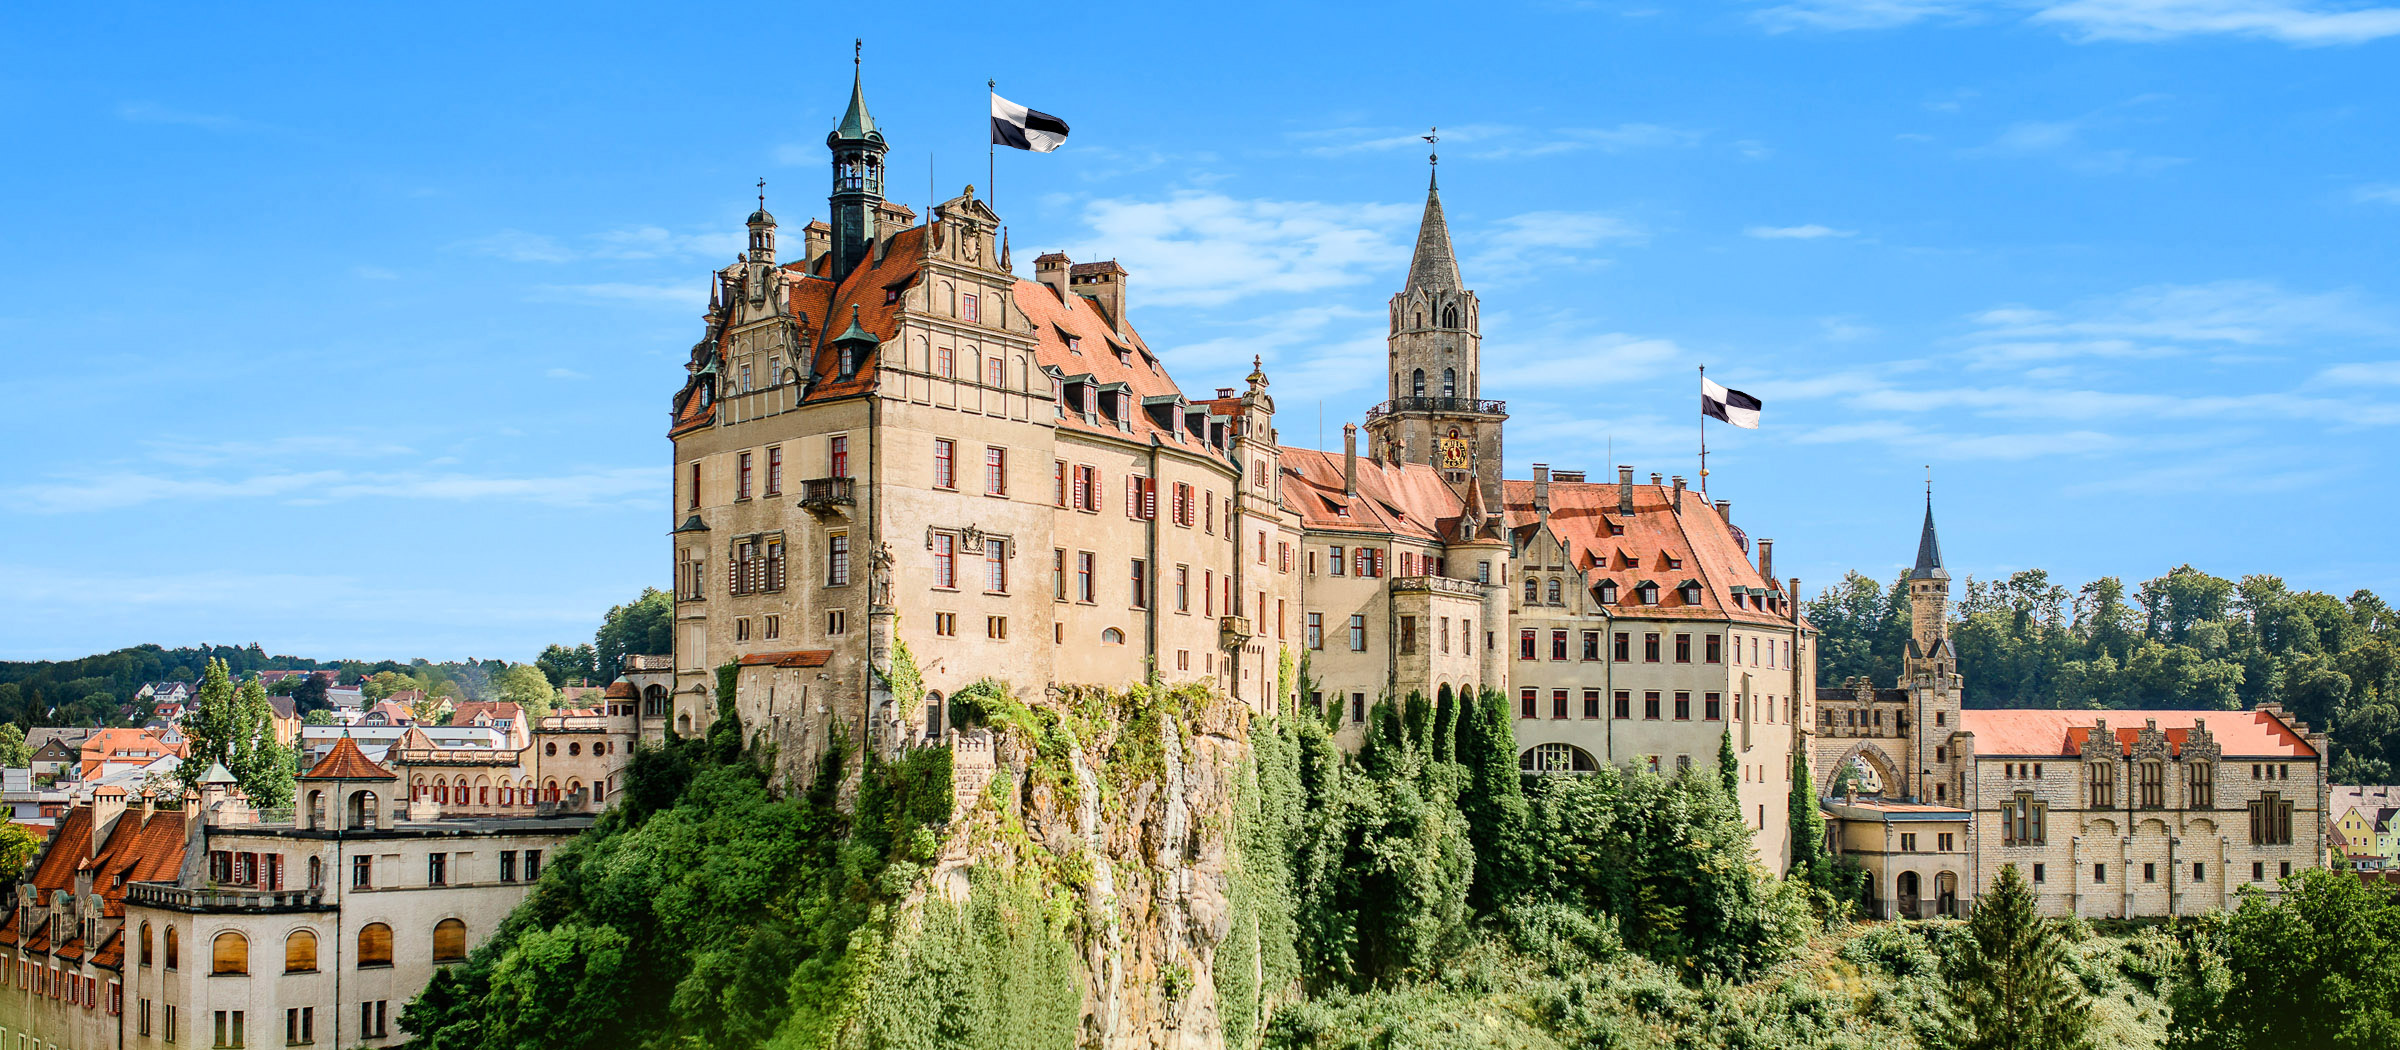 Hohenzollernschloss Sigmaringen – Deutschlands zweitgrößtes Stadtschloss